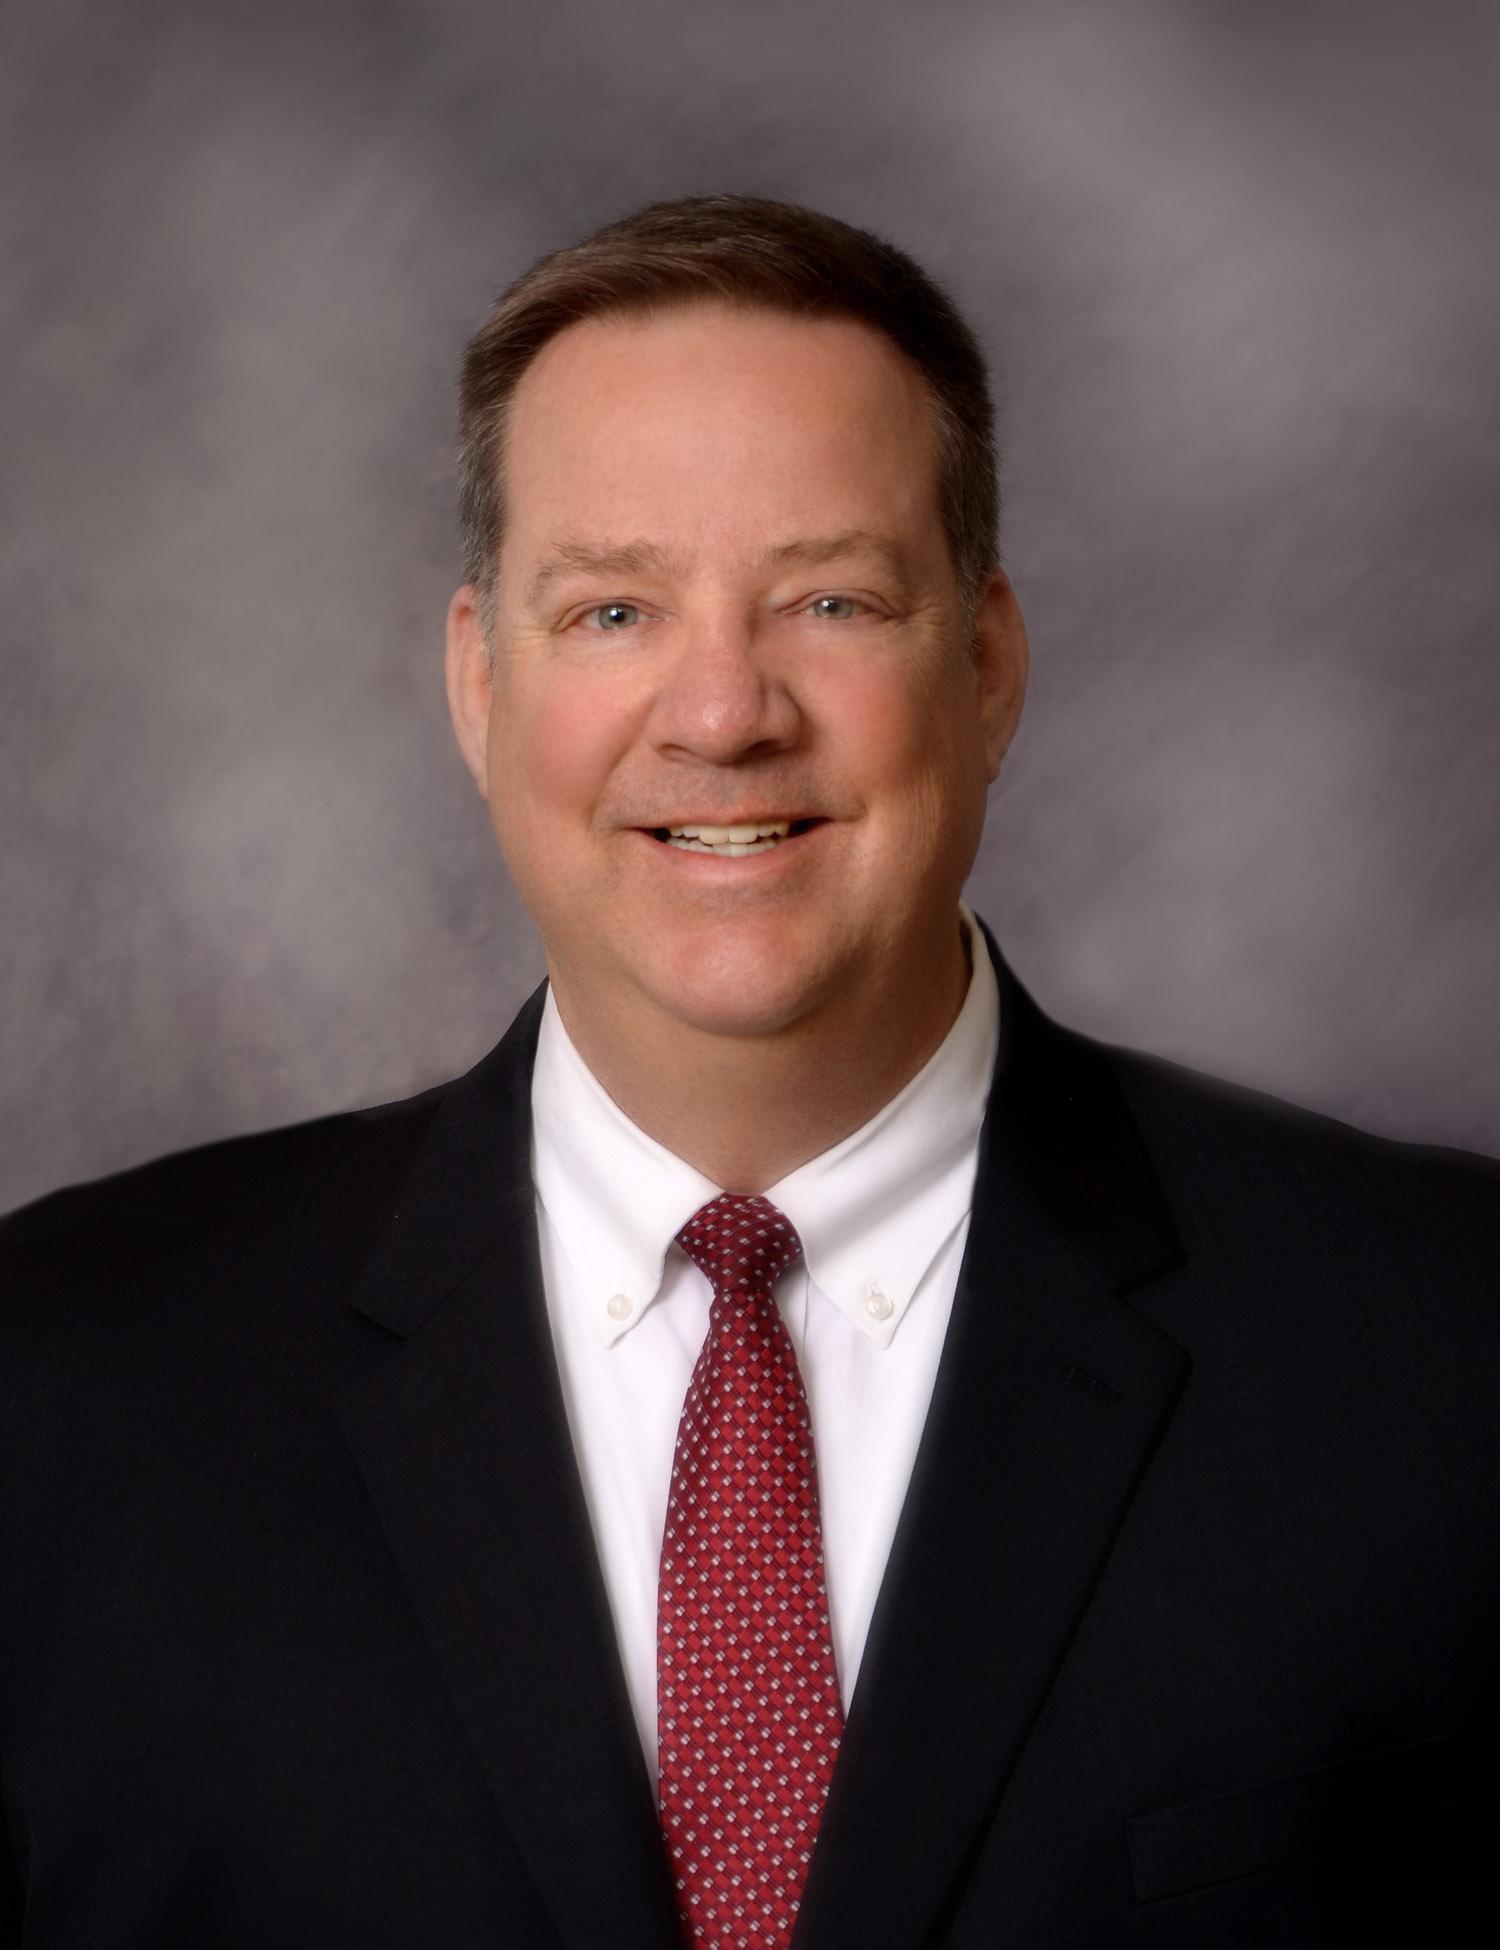 Ed Meyer